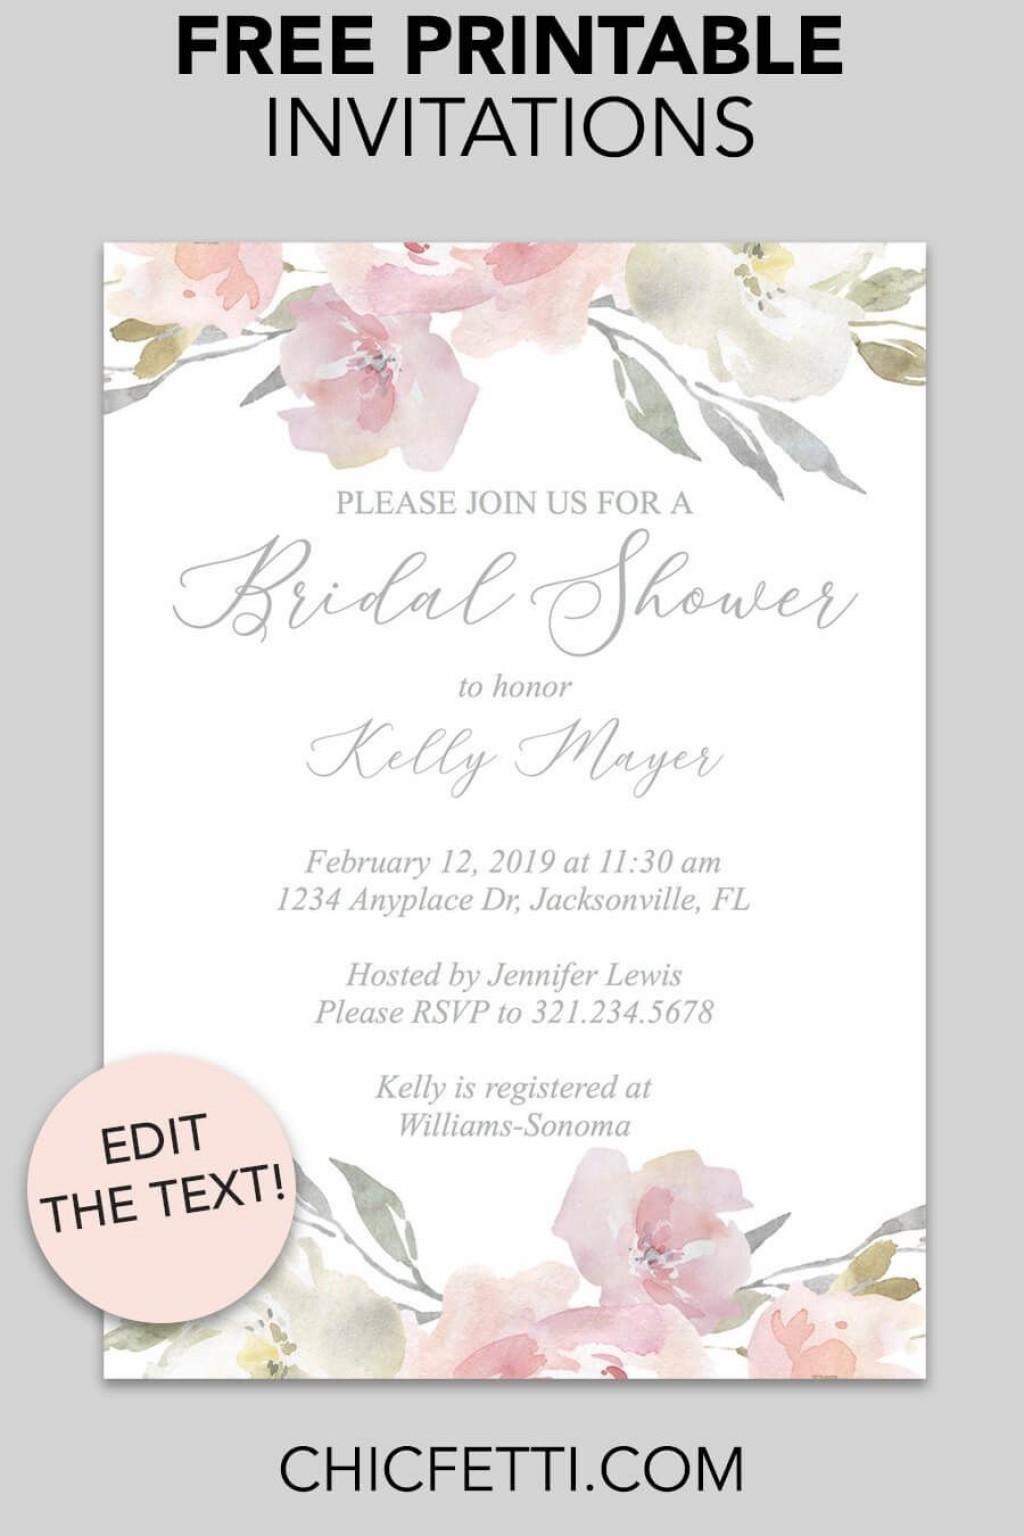 000 Unforgettable Free Bridal Shower Invite Template Sample  Invitation For Word Wedding MicrosoftLarge